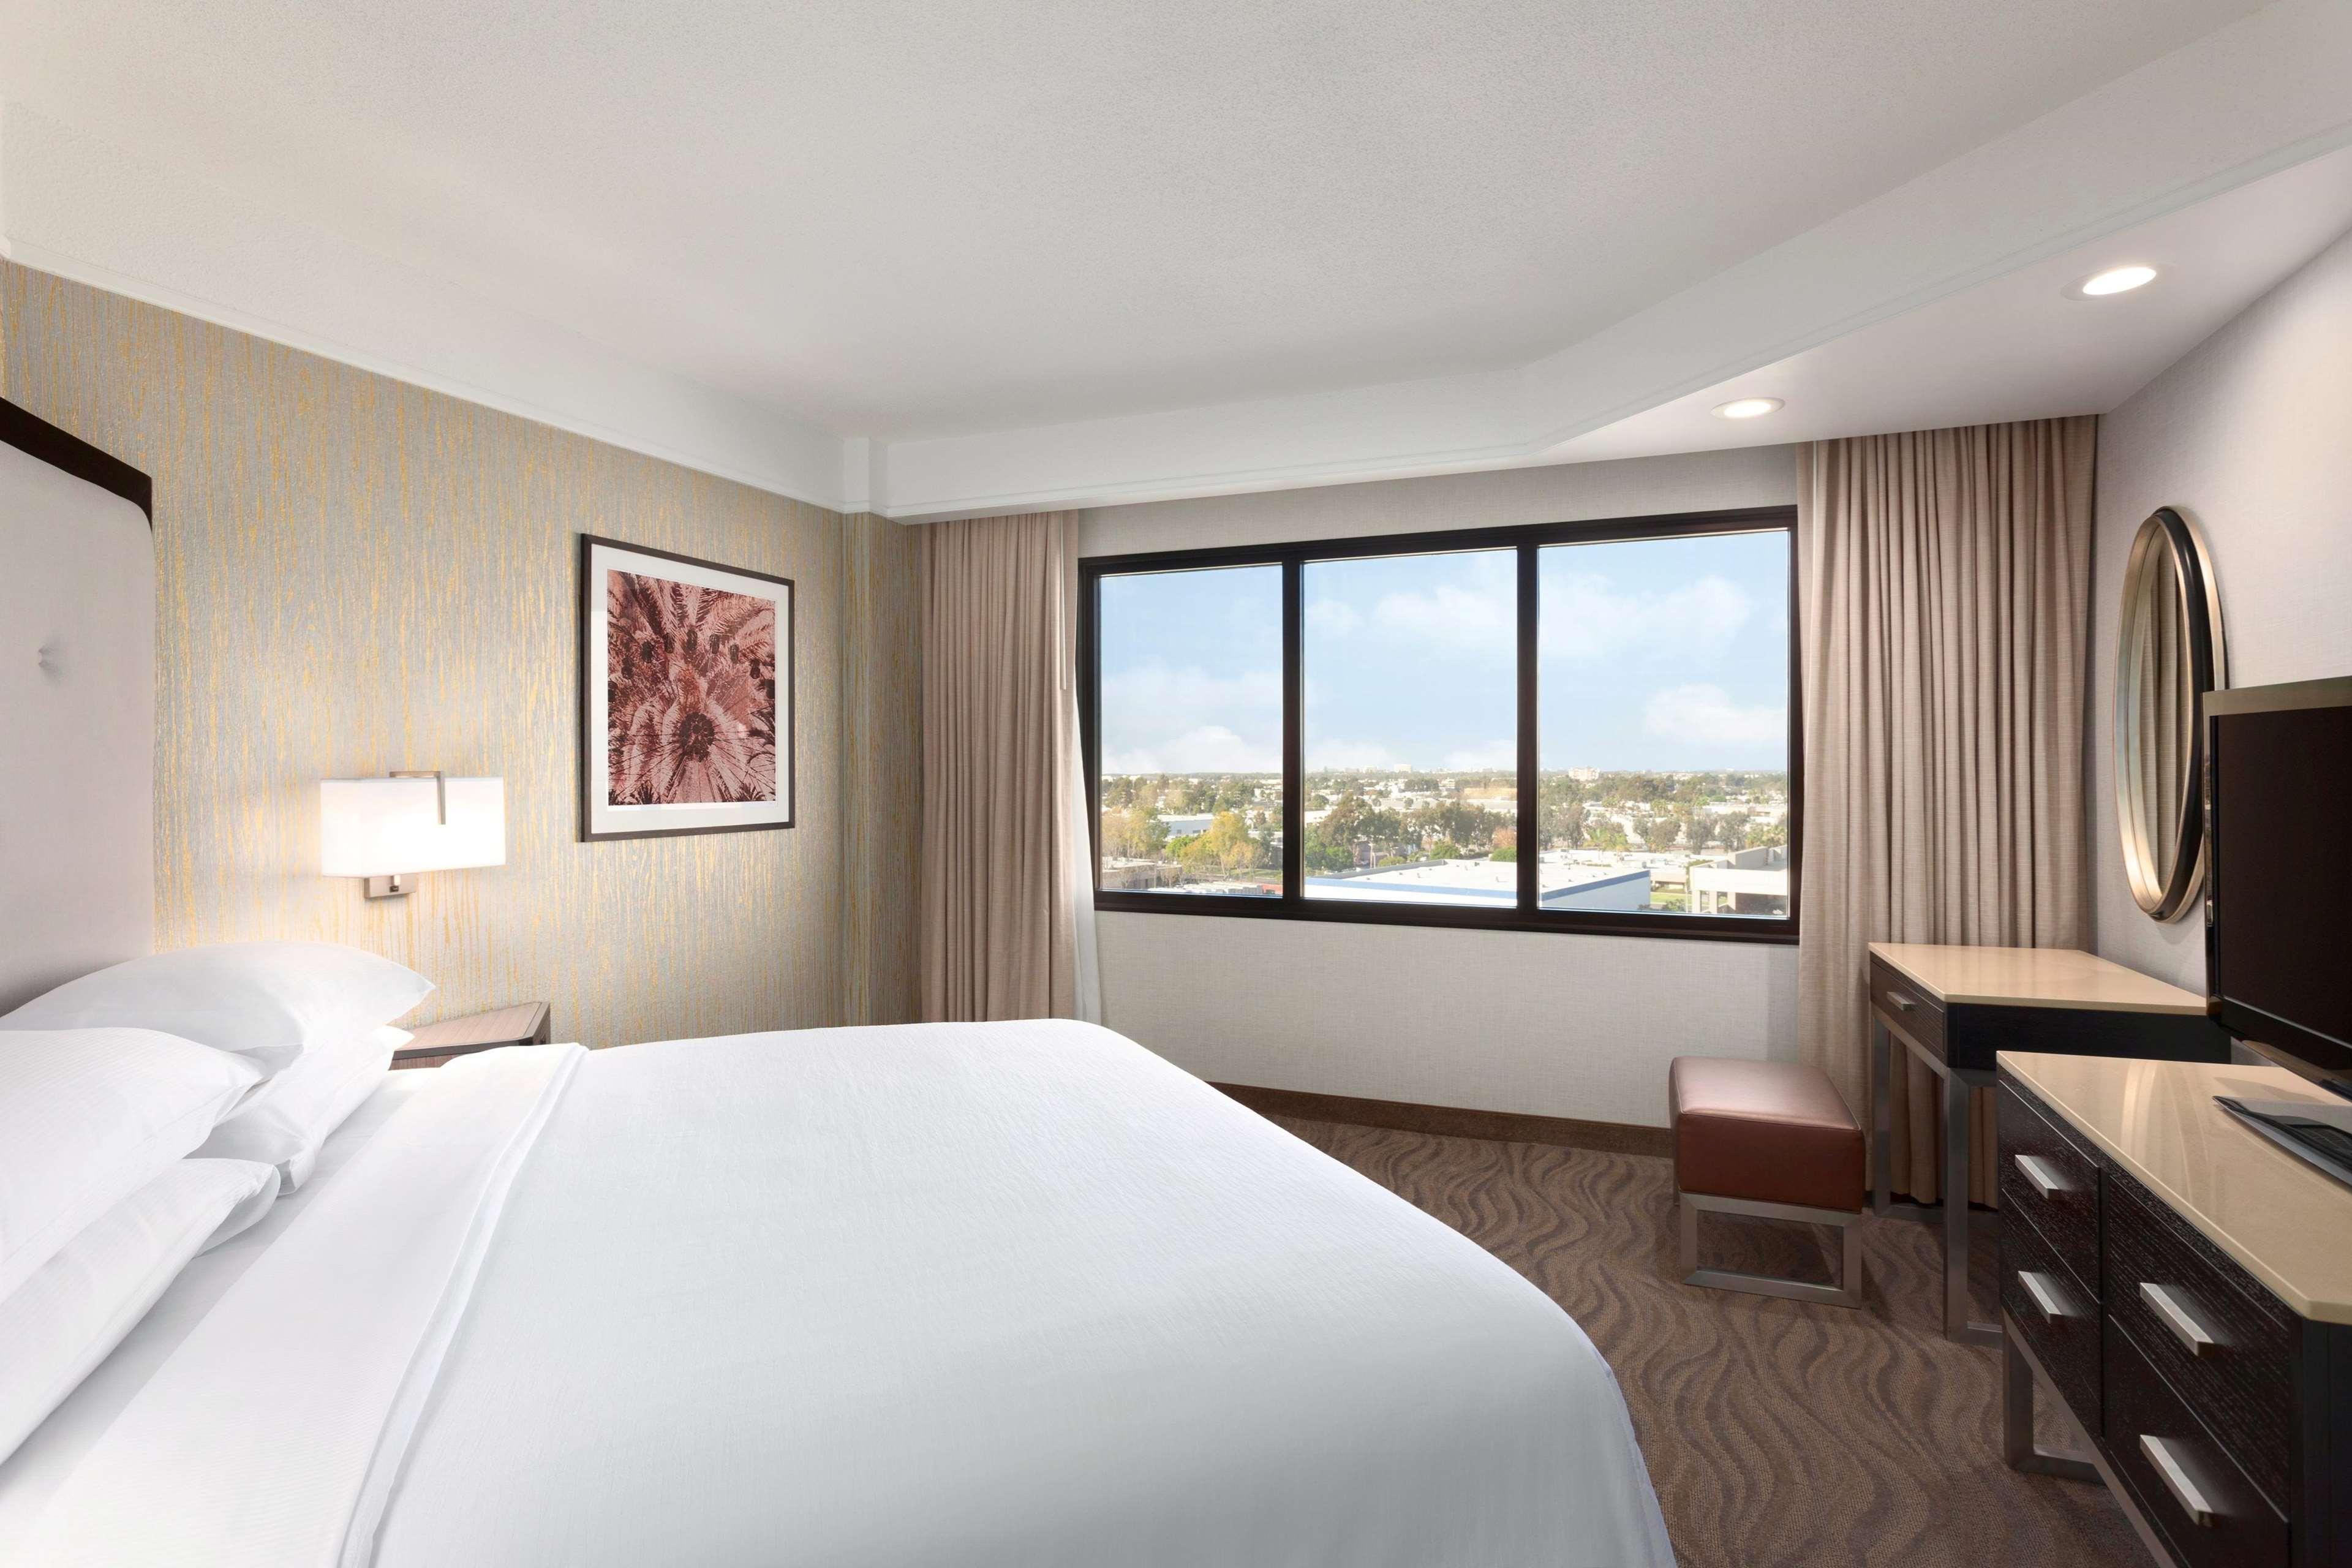 King City View Bedroom